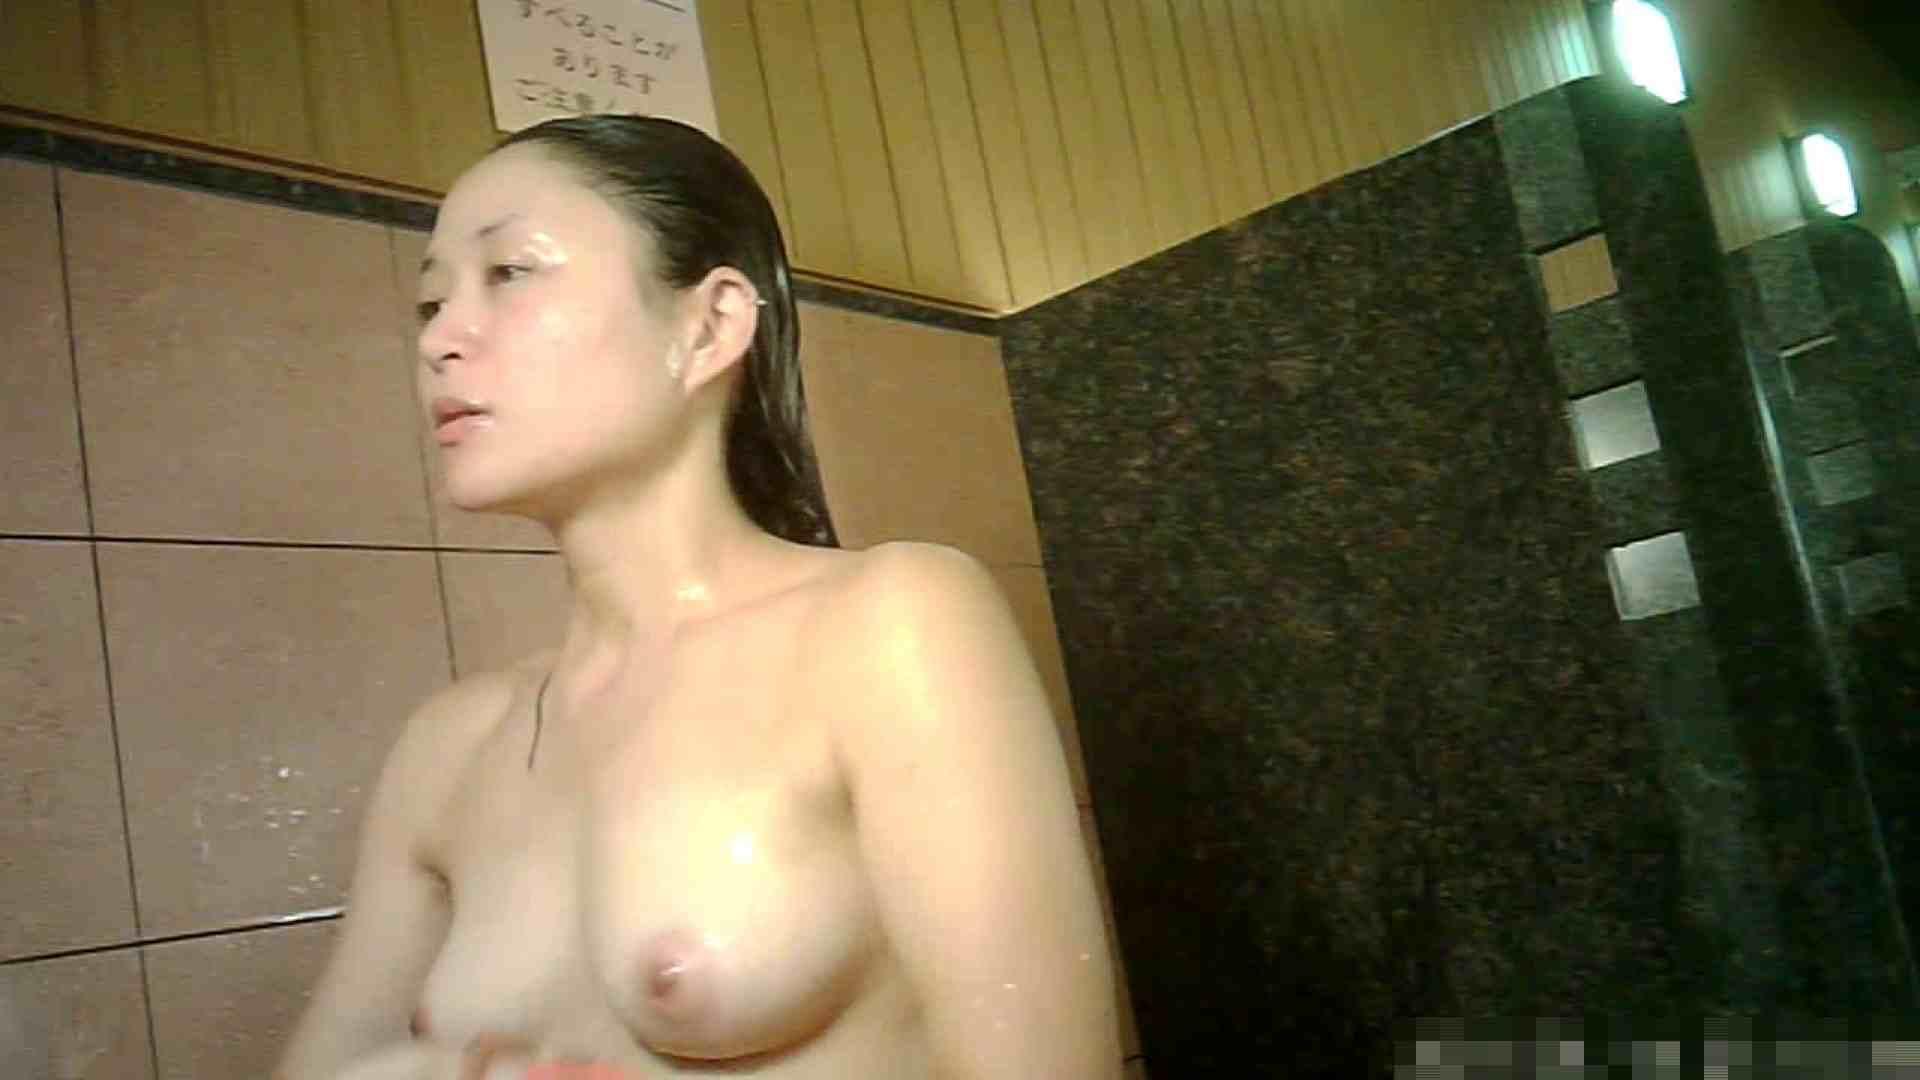 No.1 洗い場!!とっても綺麗な身体のお女市さん、乳首も綺麗です。 女湯 戯れ無修正画像 98画像 37